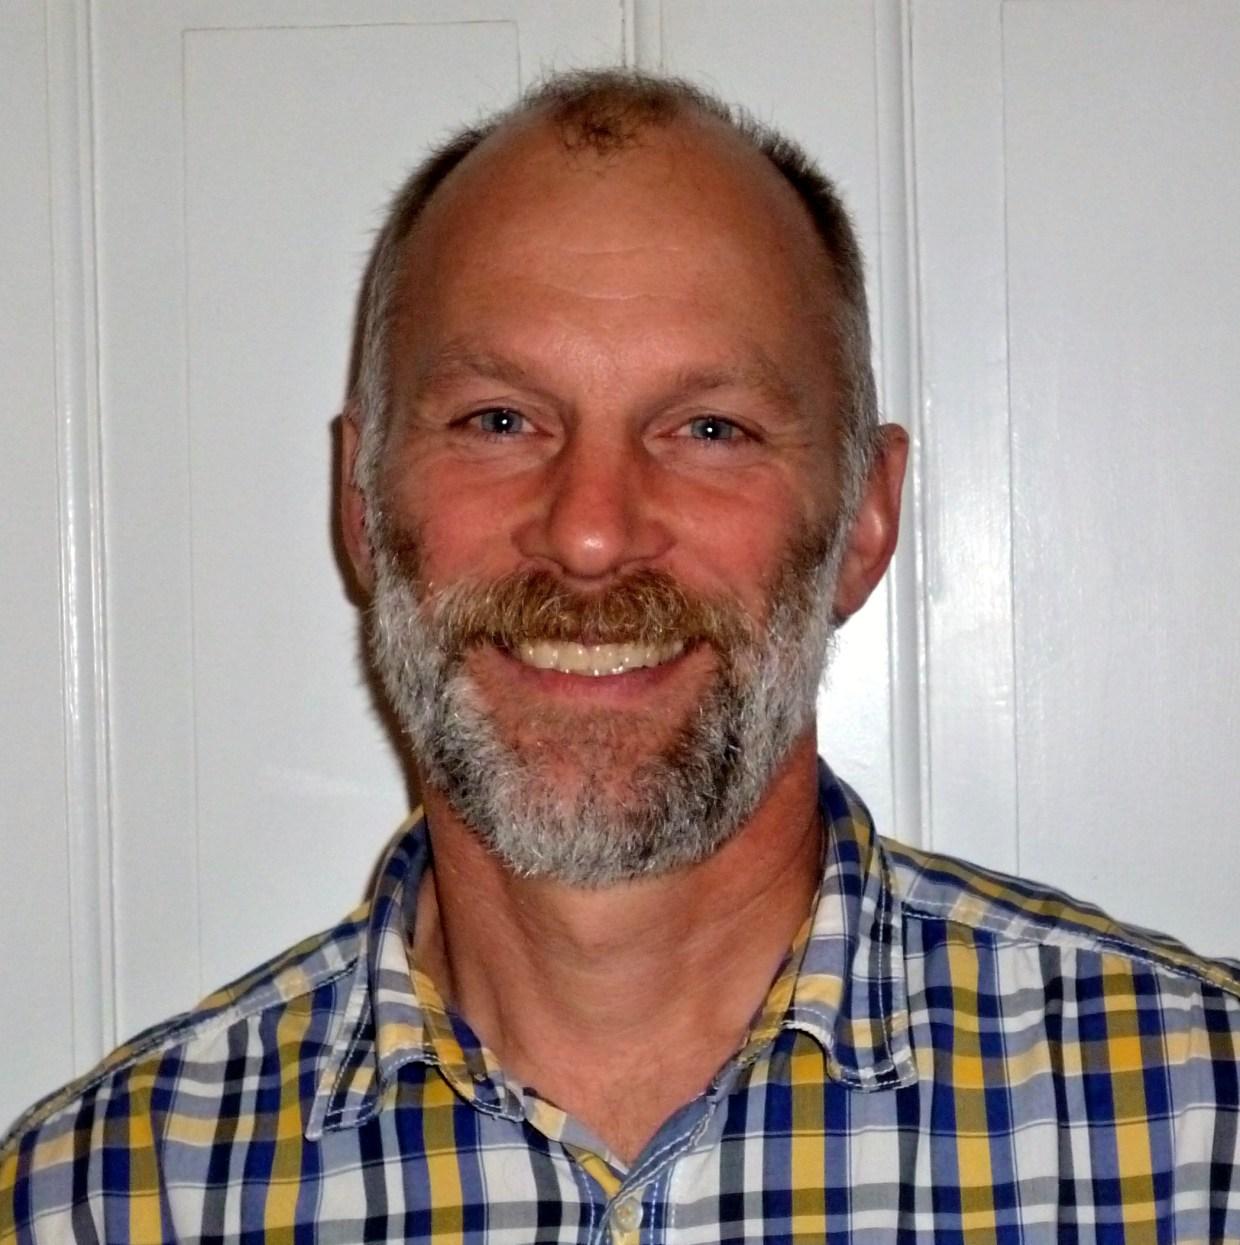 Torben Pedersen